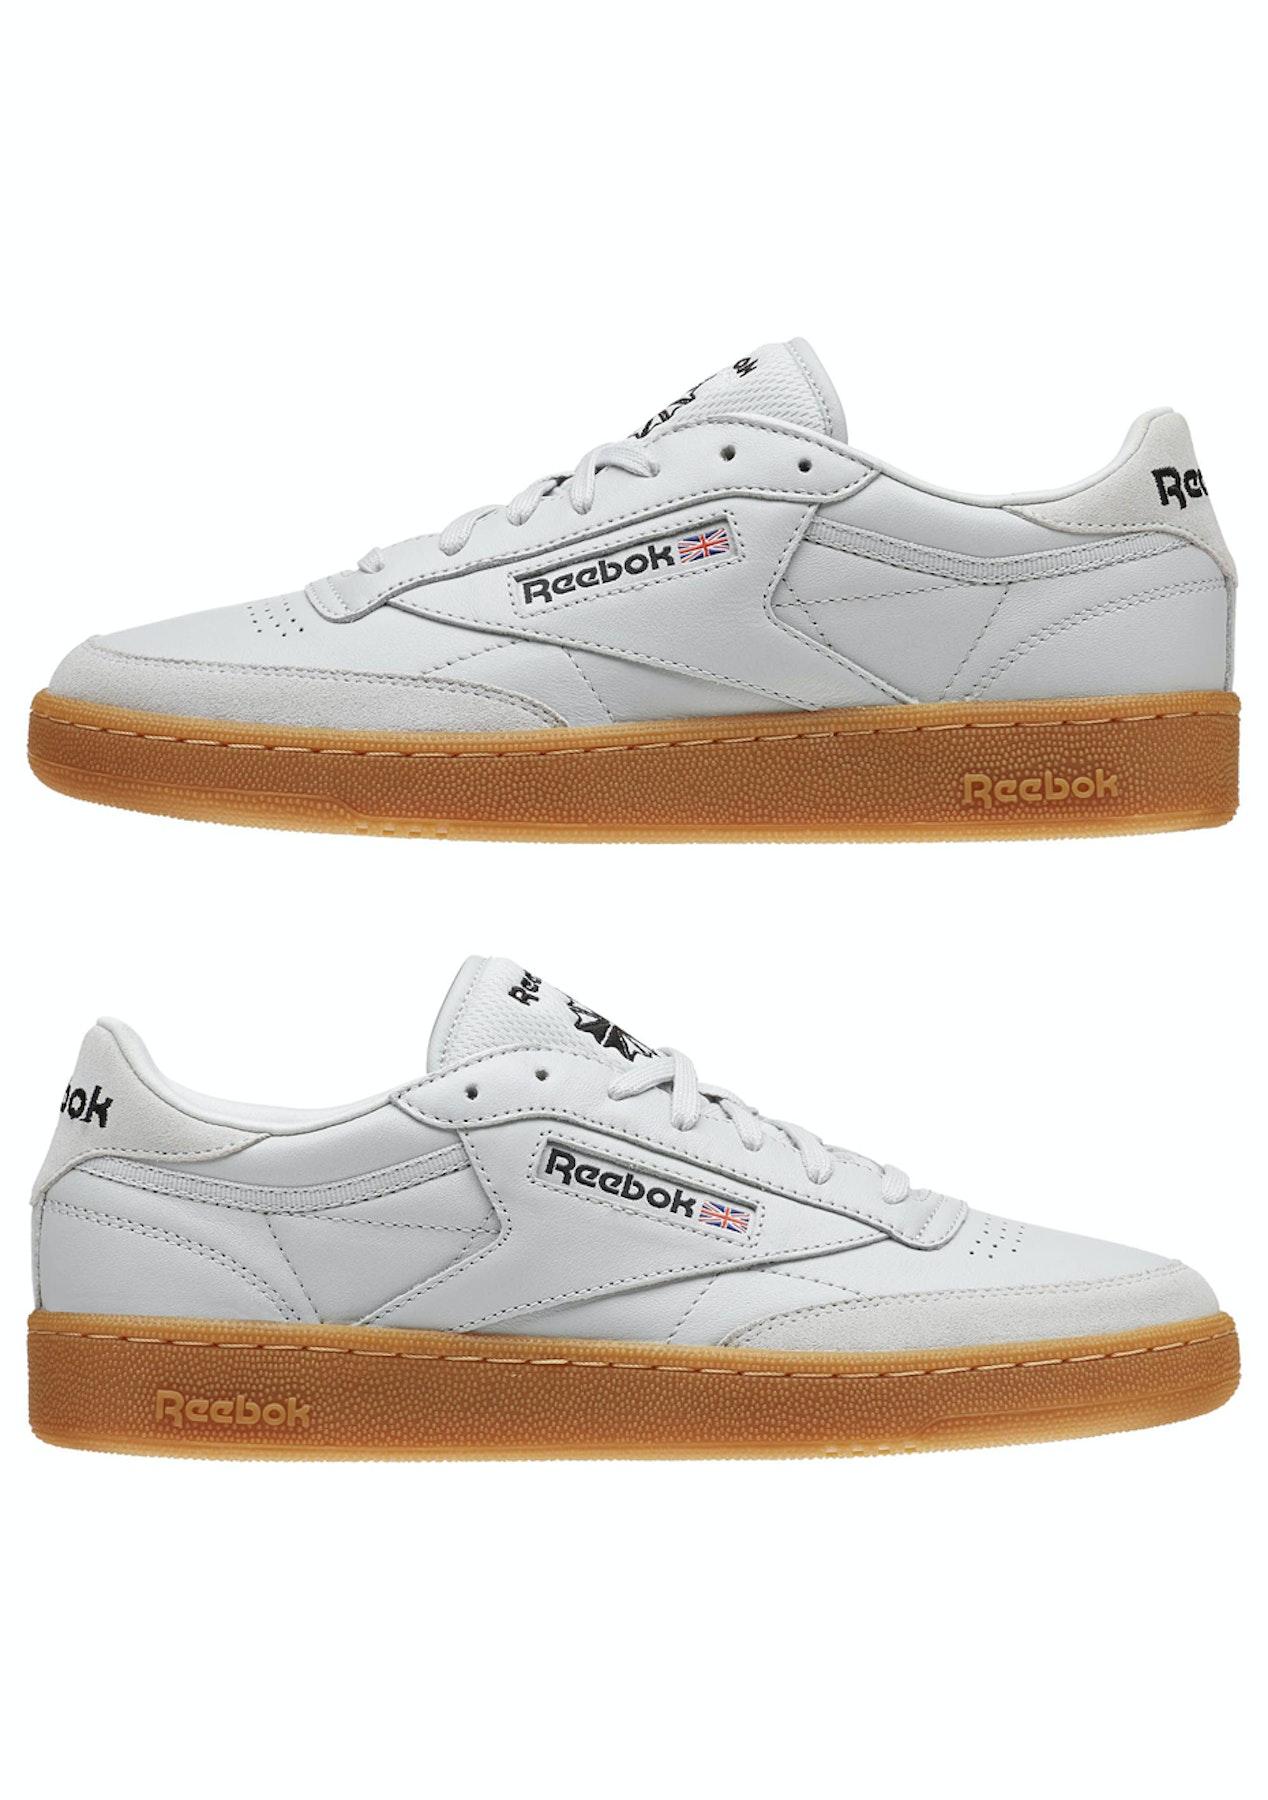 543ab6fc87b Reebok Mens - Club C 85 Tdg Skull - Skull Grey   Black   Canyon Red   Gum -  Big Brand Mens Shoes - Onceit